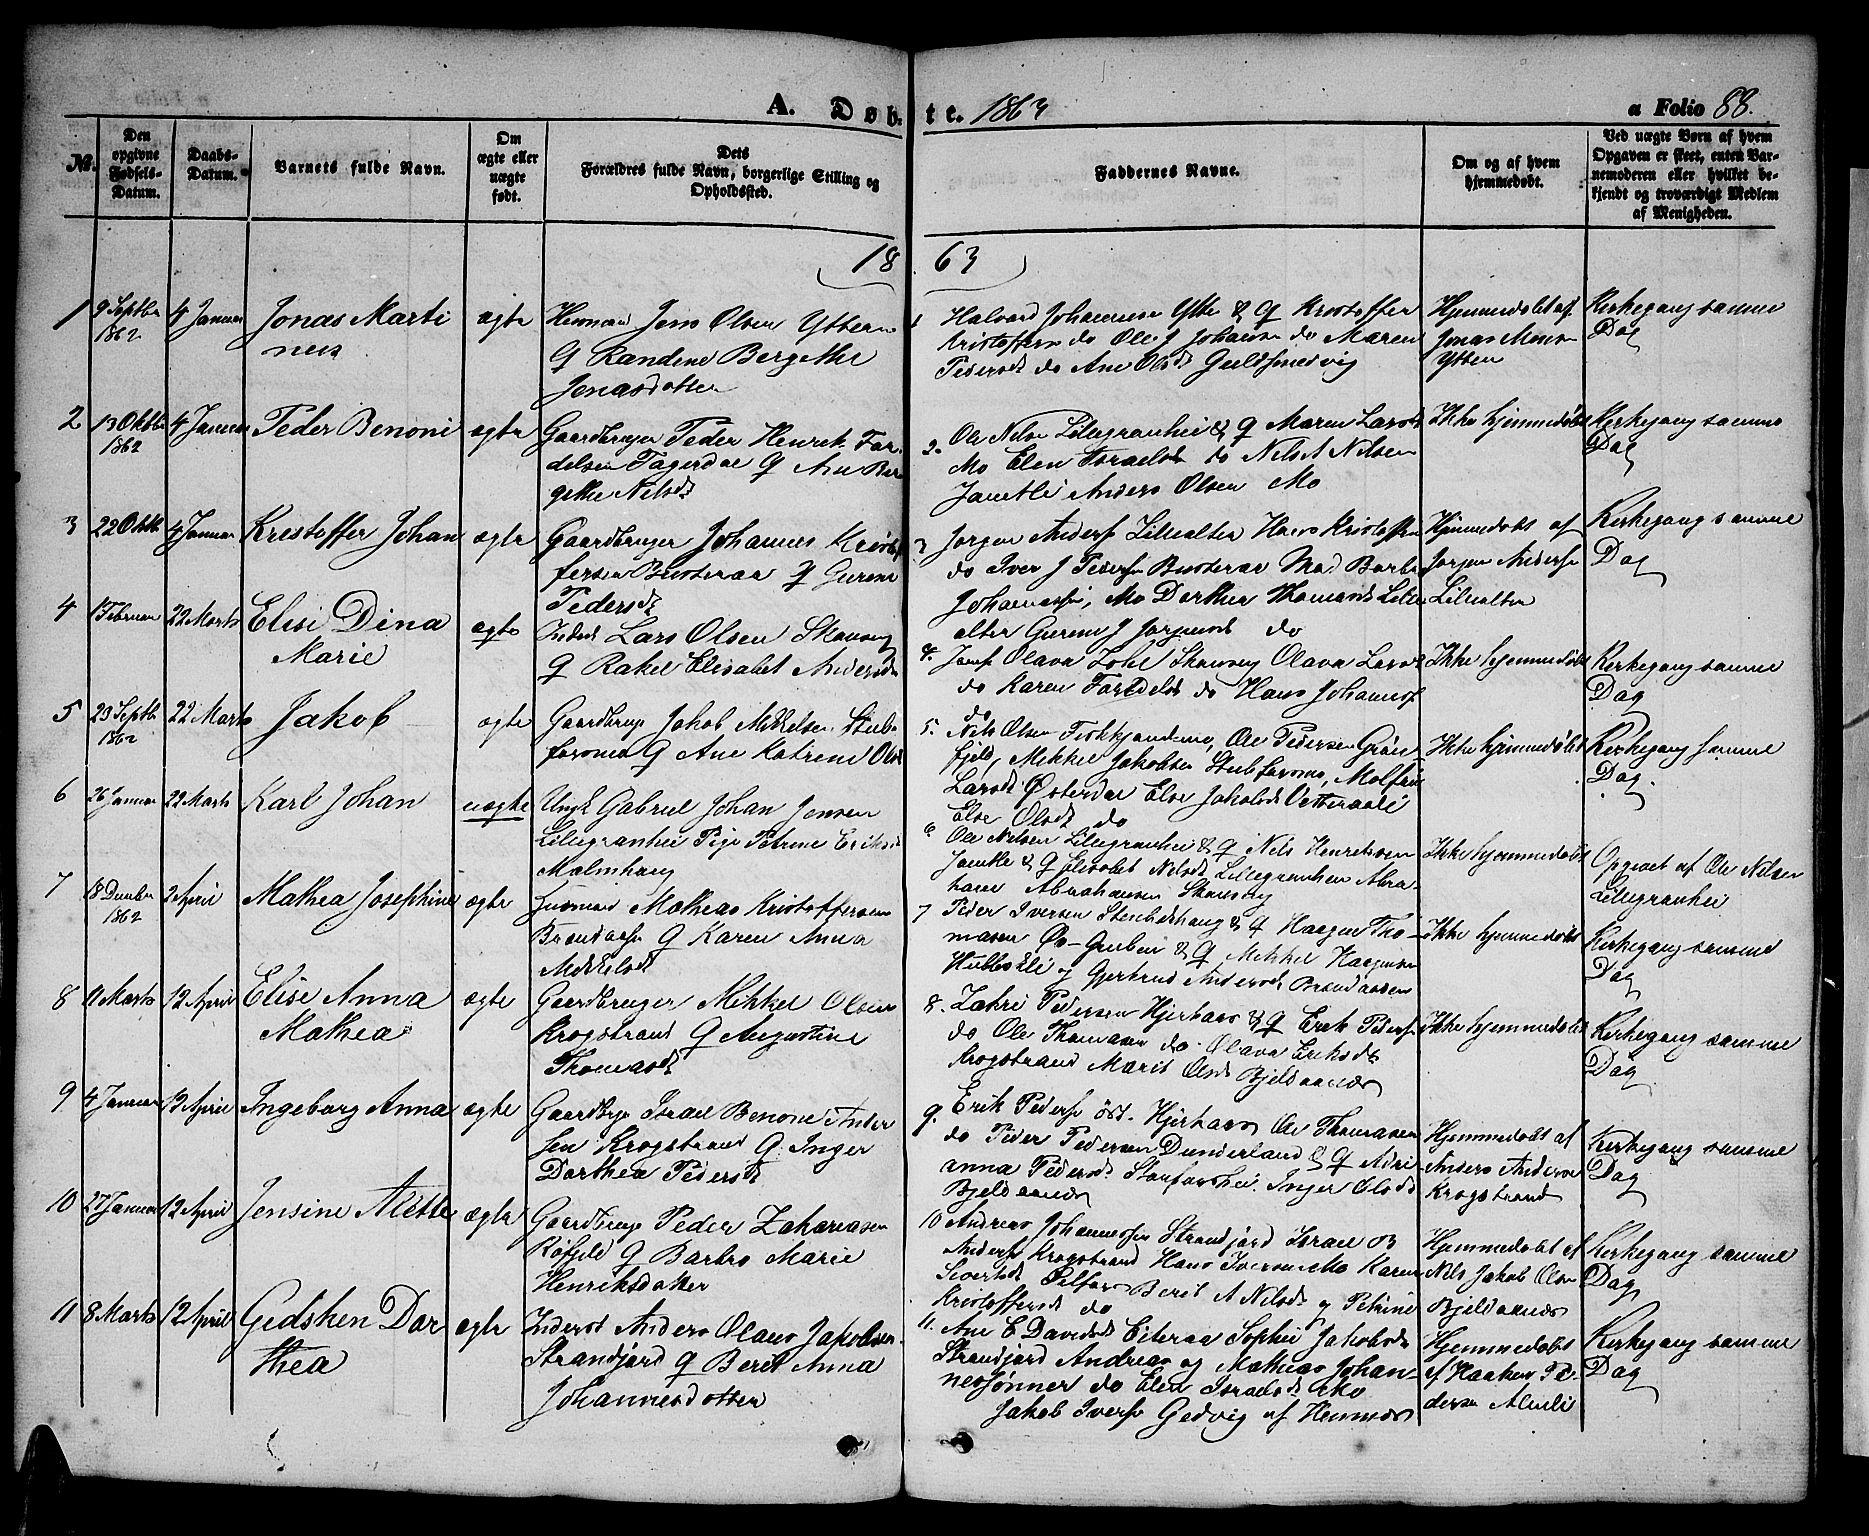 SAT, Ministerialprotokoller, klokkerbøker og fødselsregistre - Nordland, 827/L0414: Klokkerbok nr. 827C03, 1853-1865, s. 88